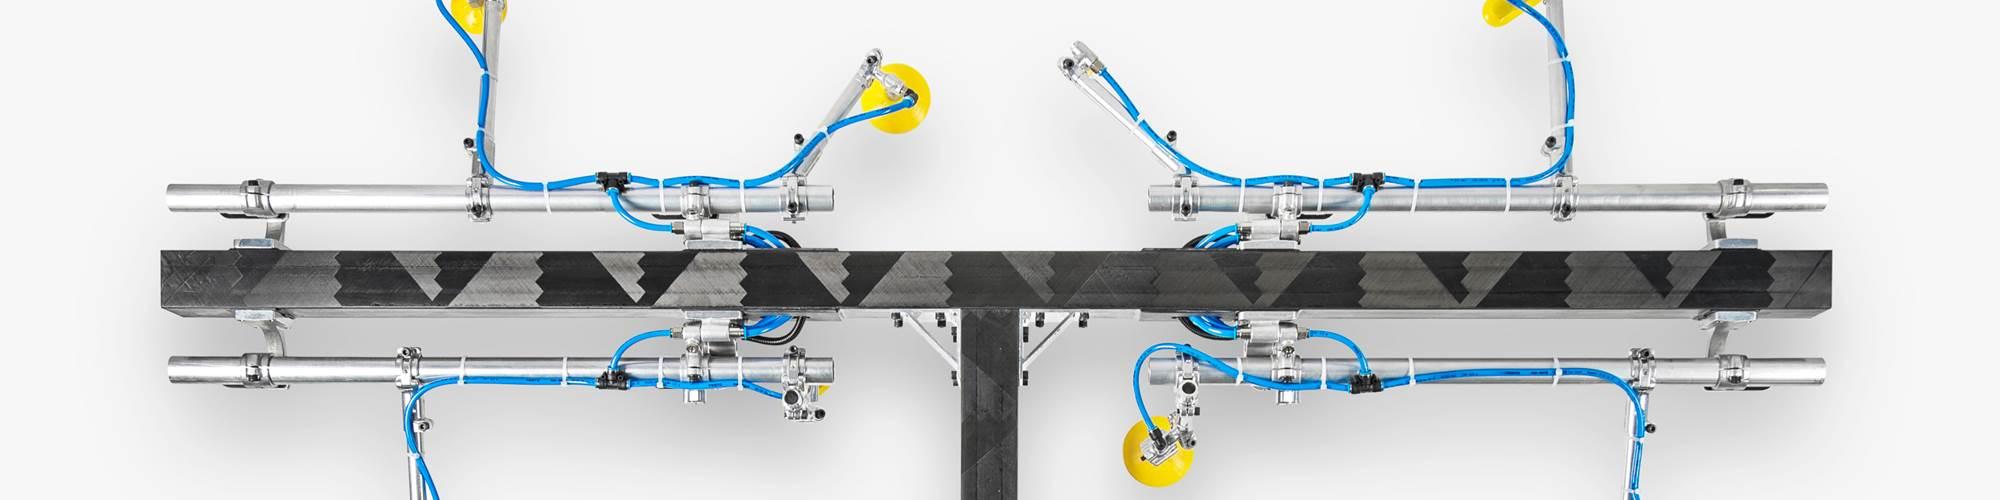 carbon fiber composite T-boom for industrial applications